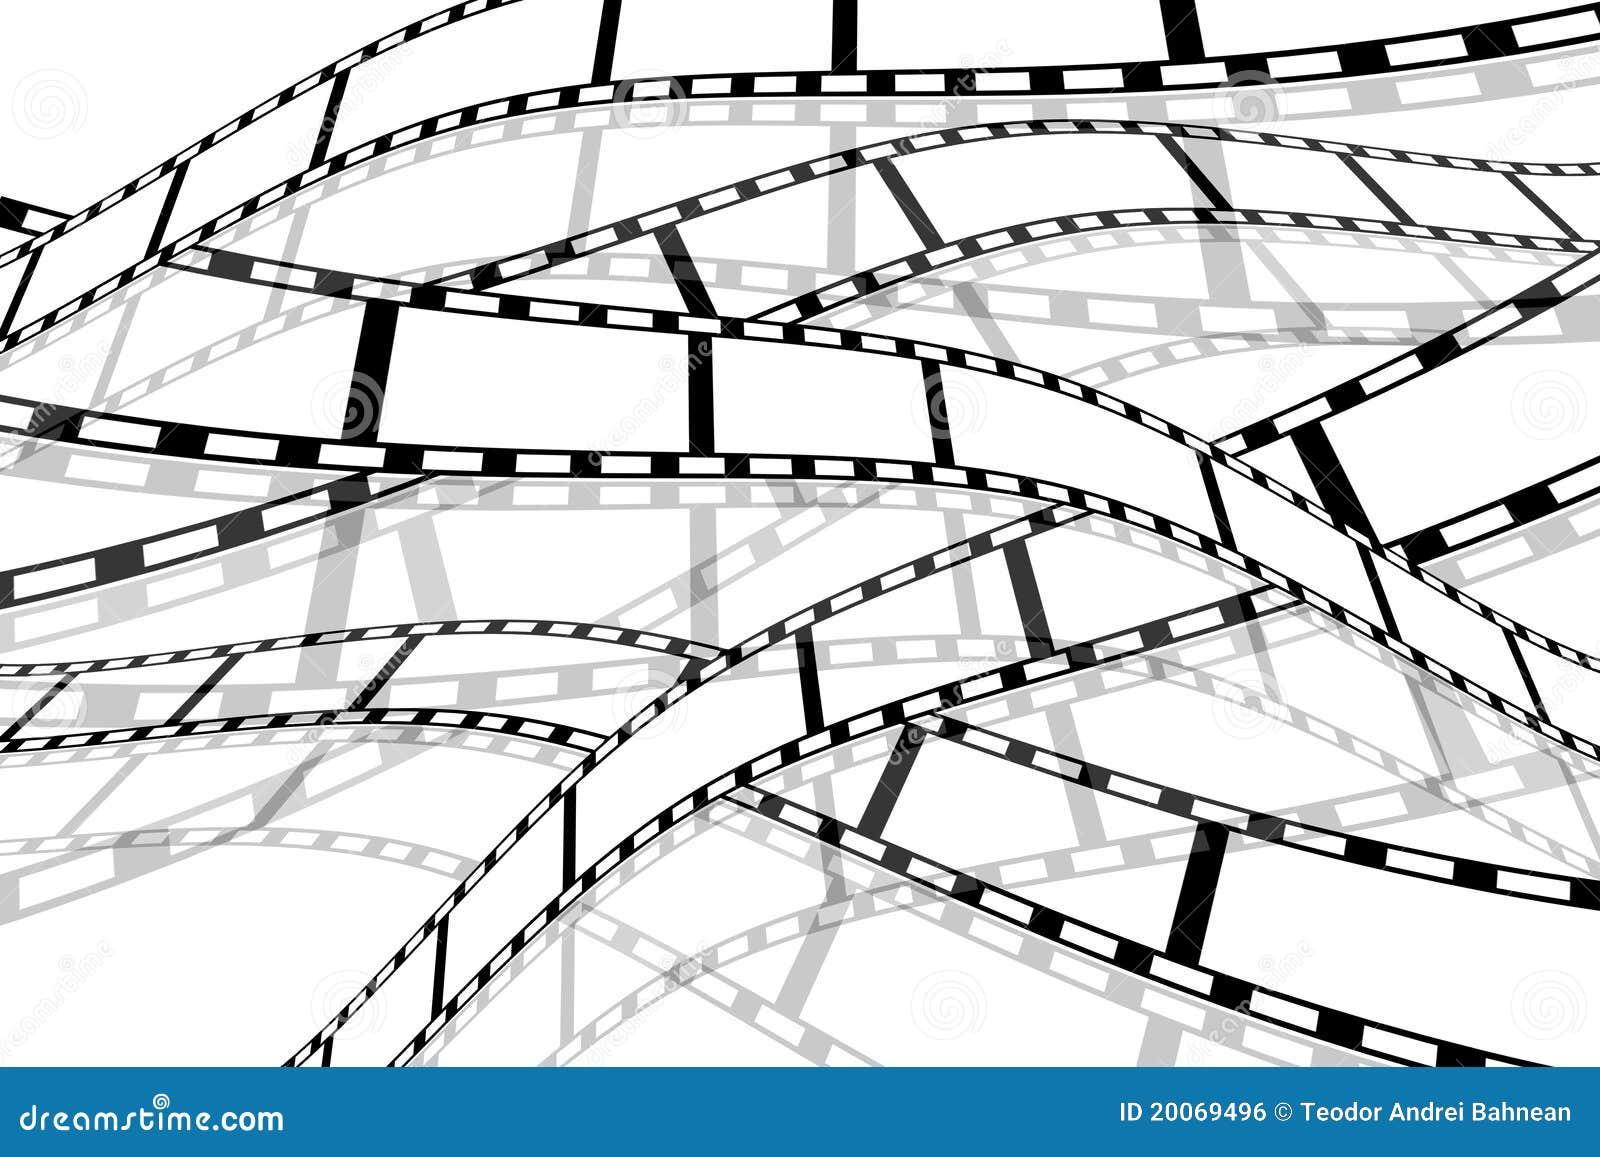 Carretéis de película